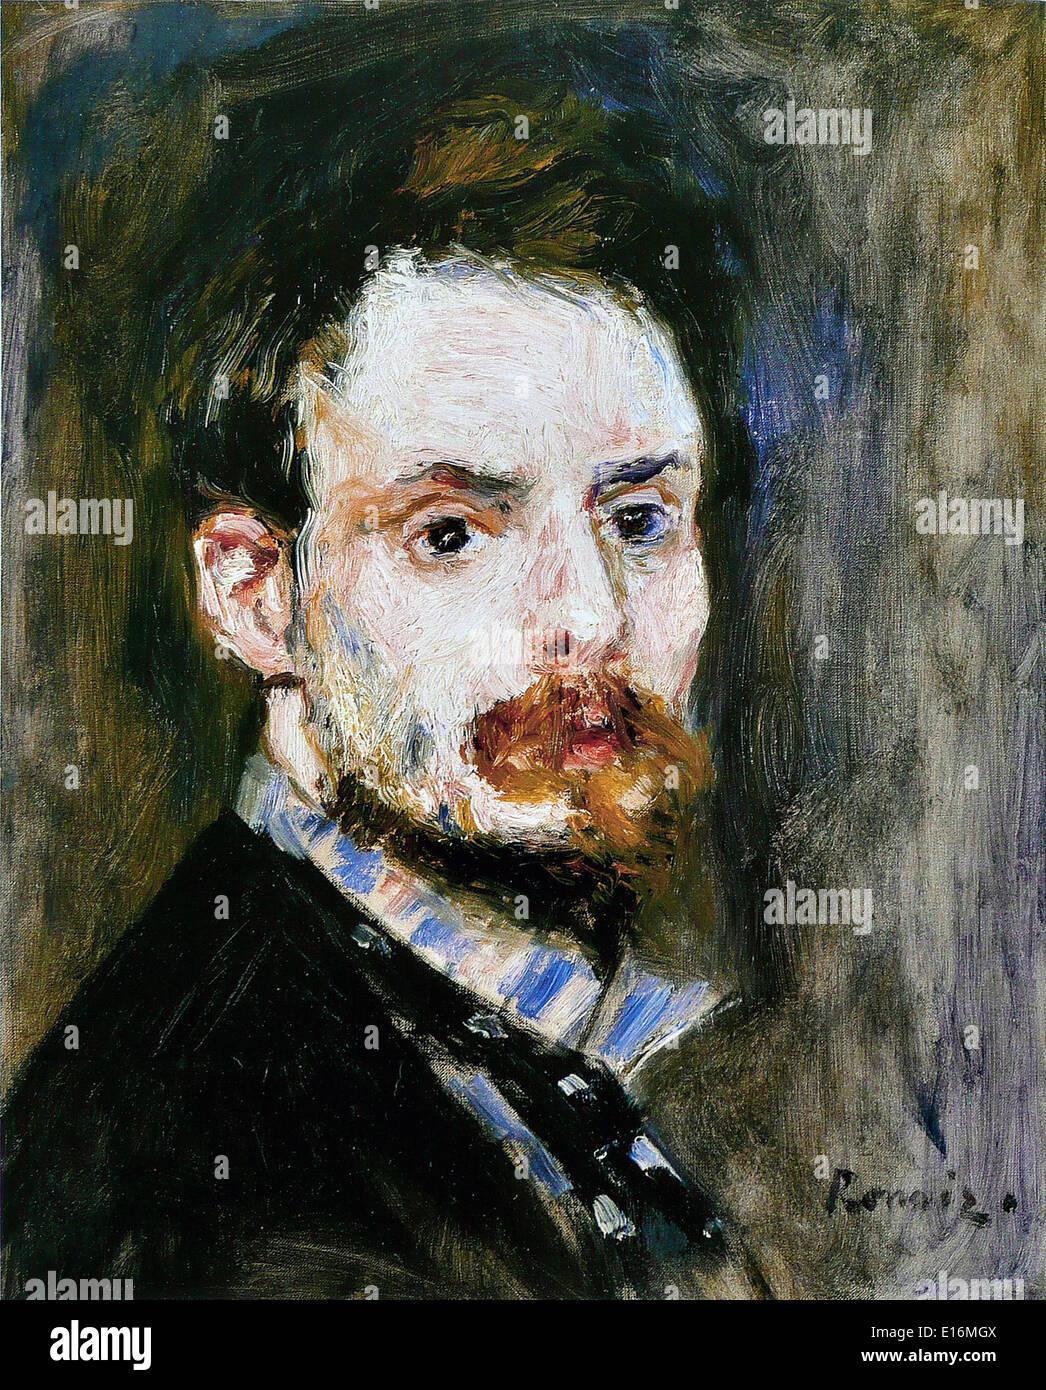 Self-Portrait by Pierre-Auguste Renoir, 1875 - Stock Image